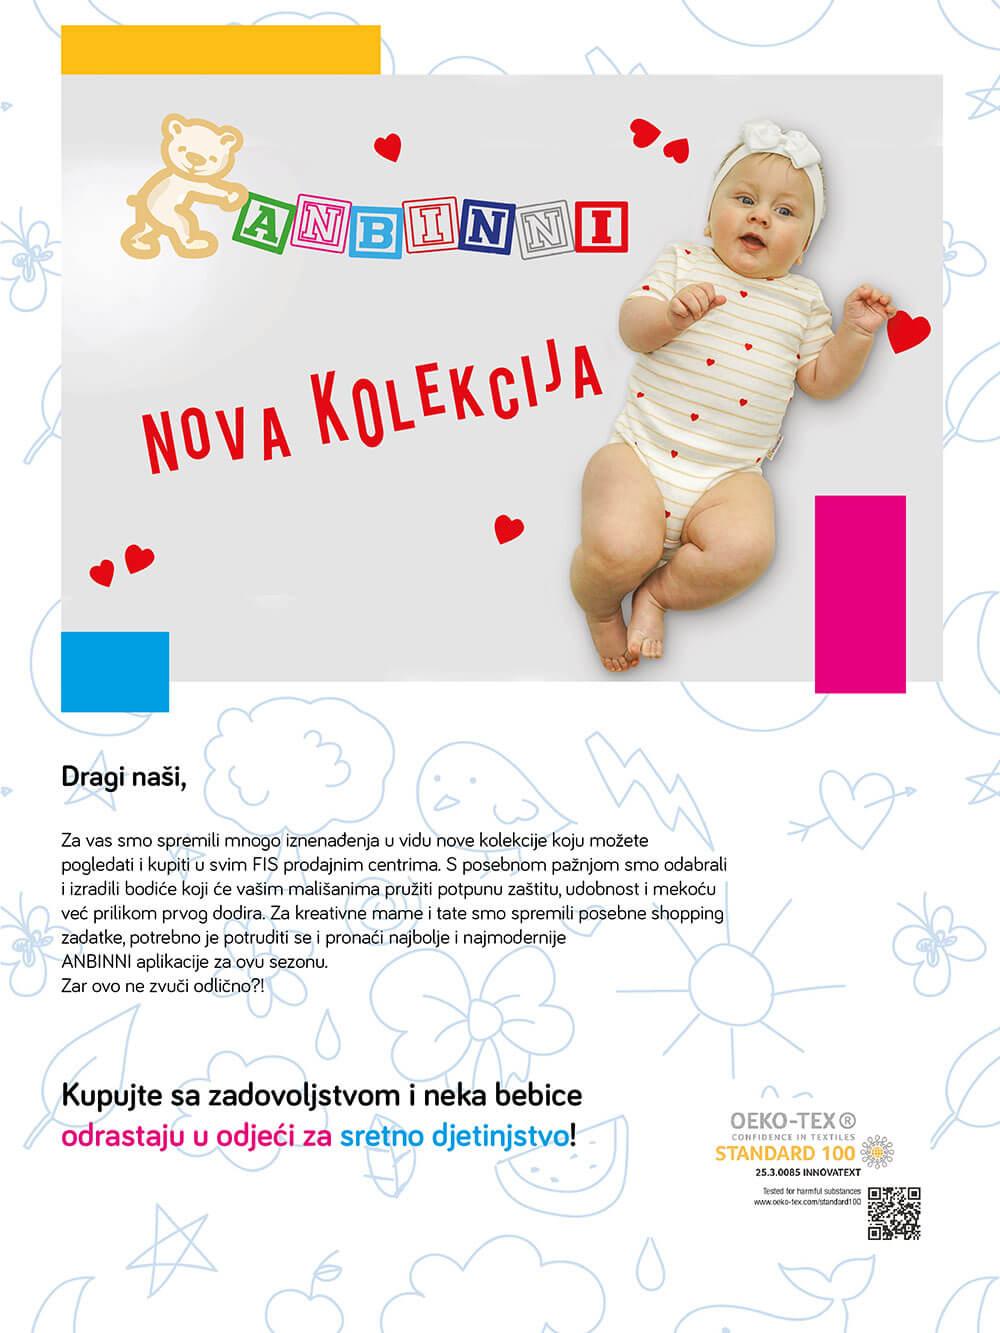 FIS Akcijski Katalog JUN 2021 eKatalozi.com 04.06. 23.06. 23